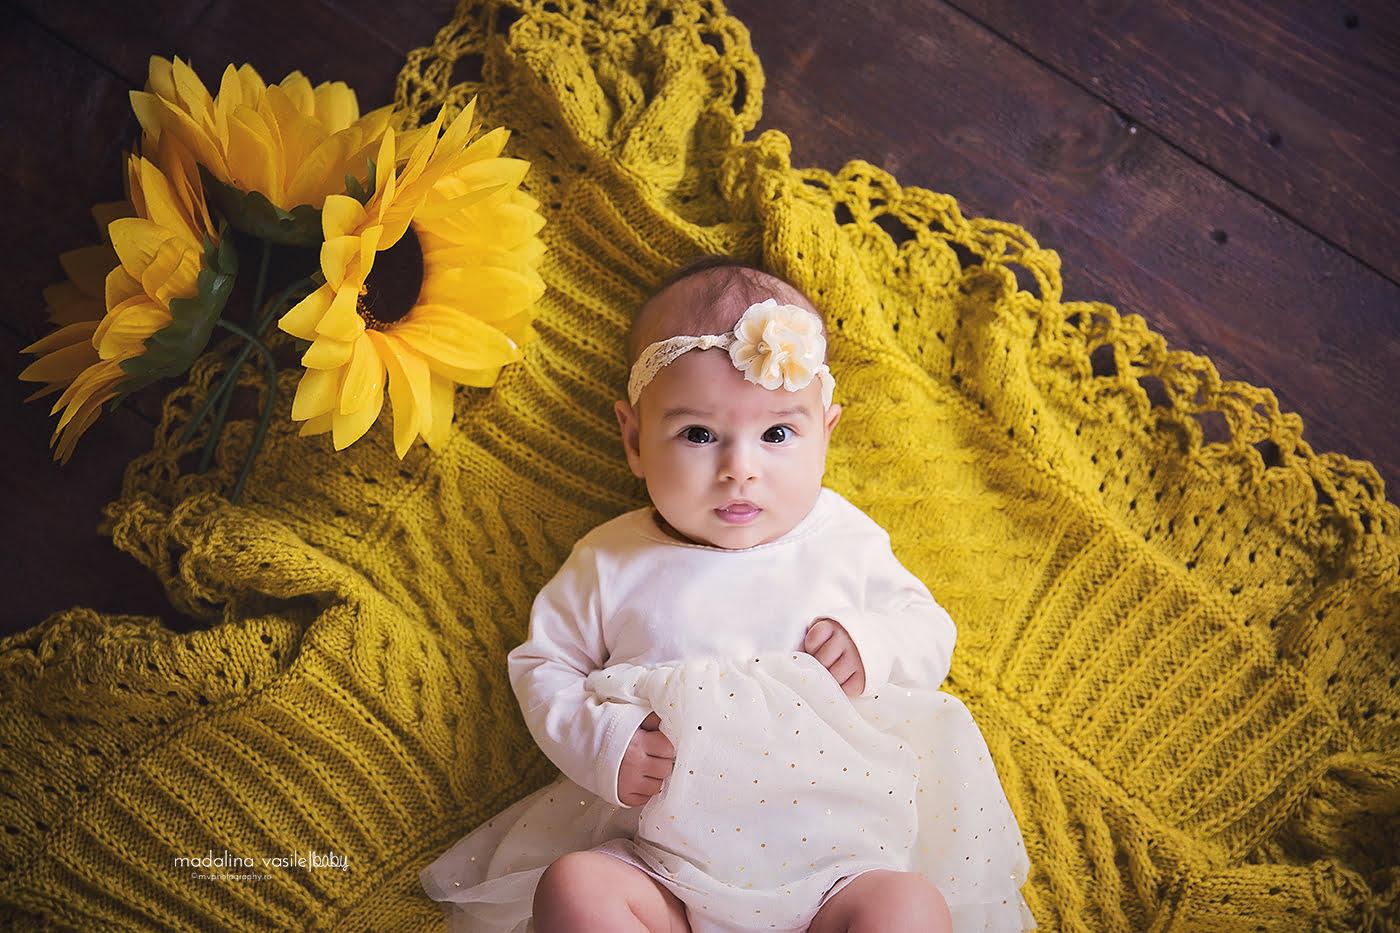 sedinta-foto-bebe-copii-familie-bebelusi-fotograf-bucuresti-pret-studio